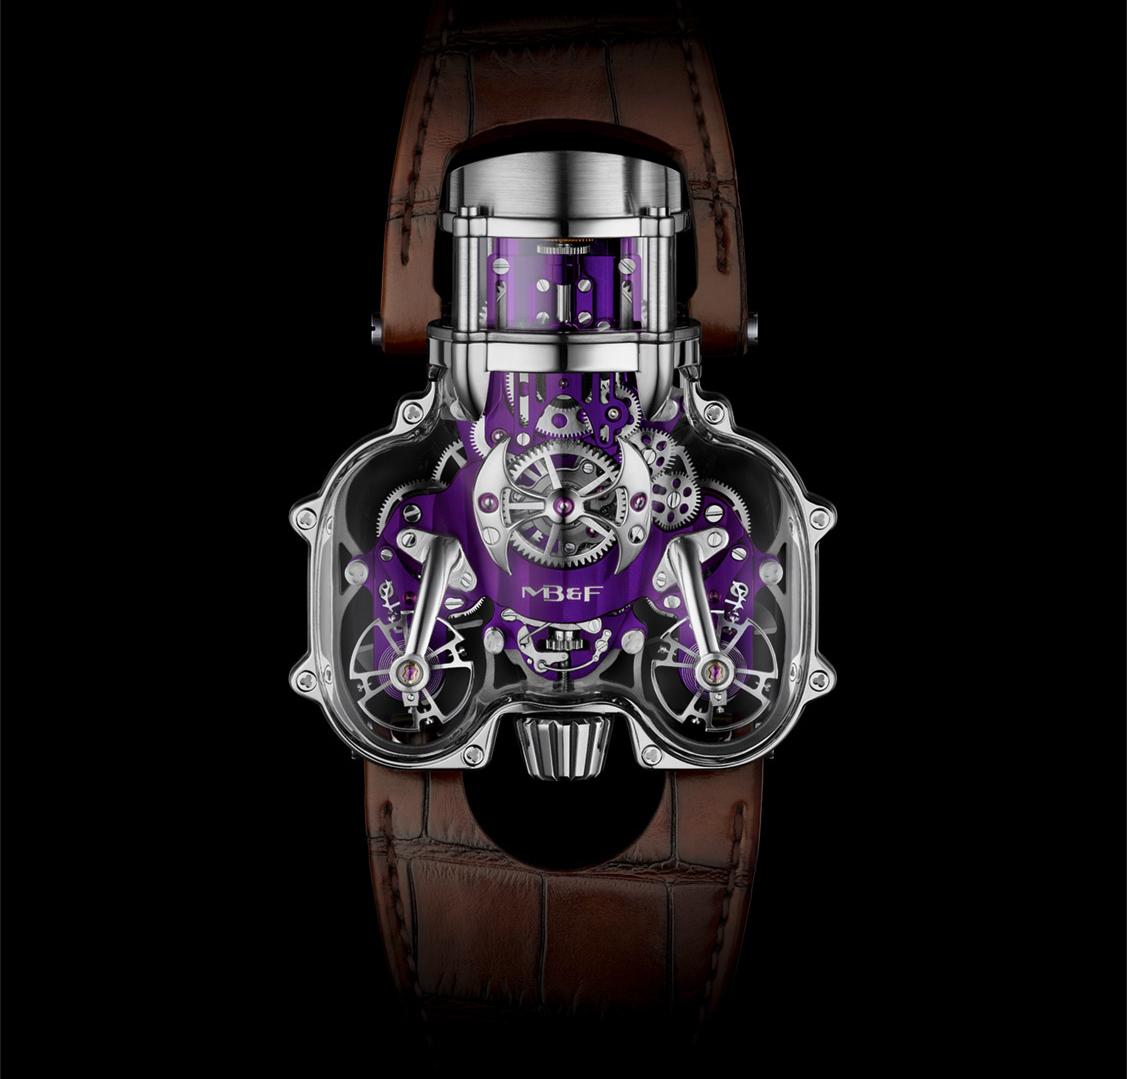 mbandf_hm9_sv_wg_purple_top_-_europa_star_magazine_2021